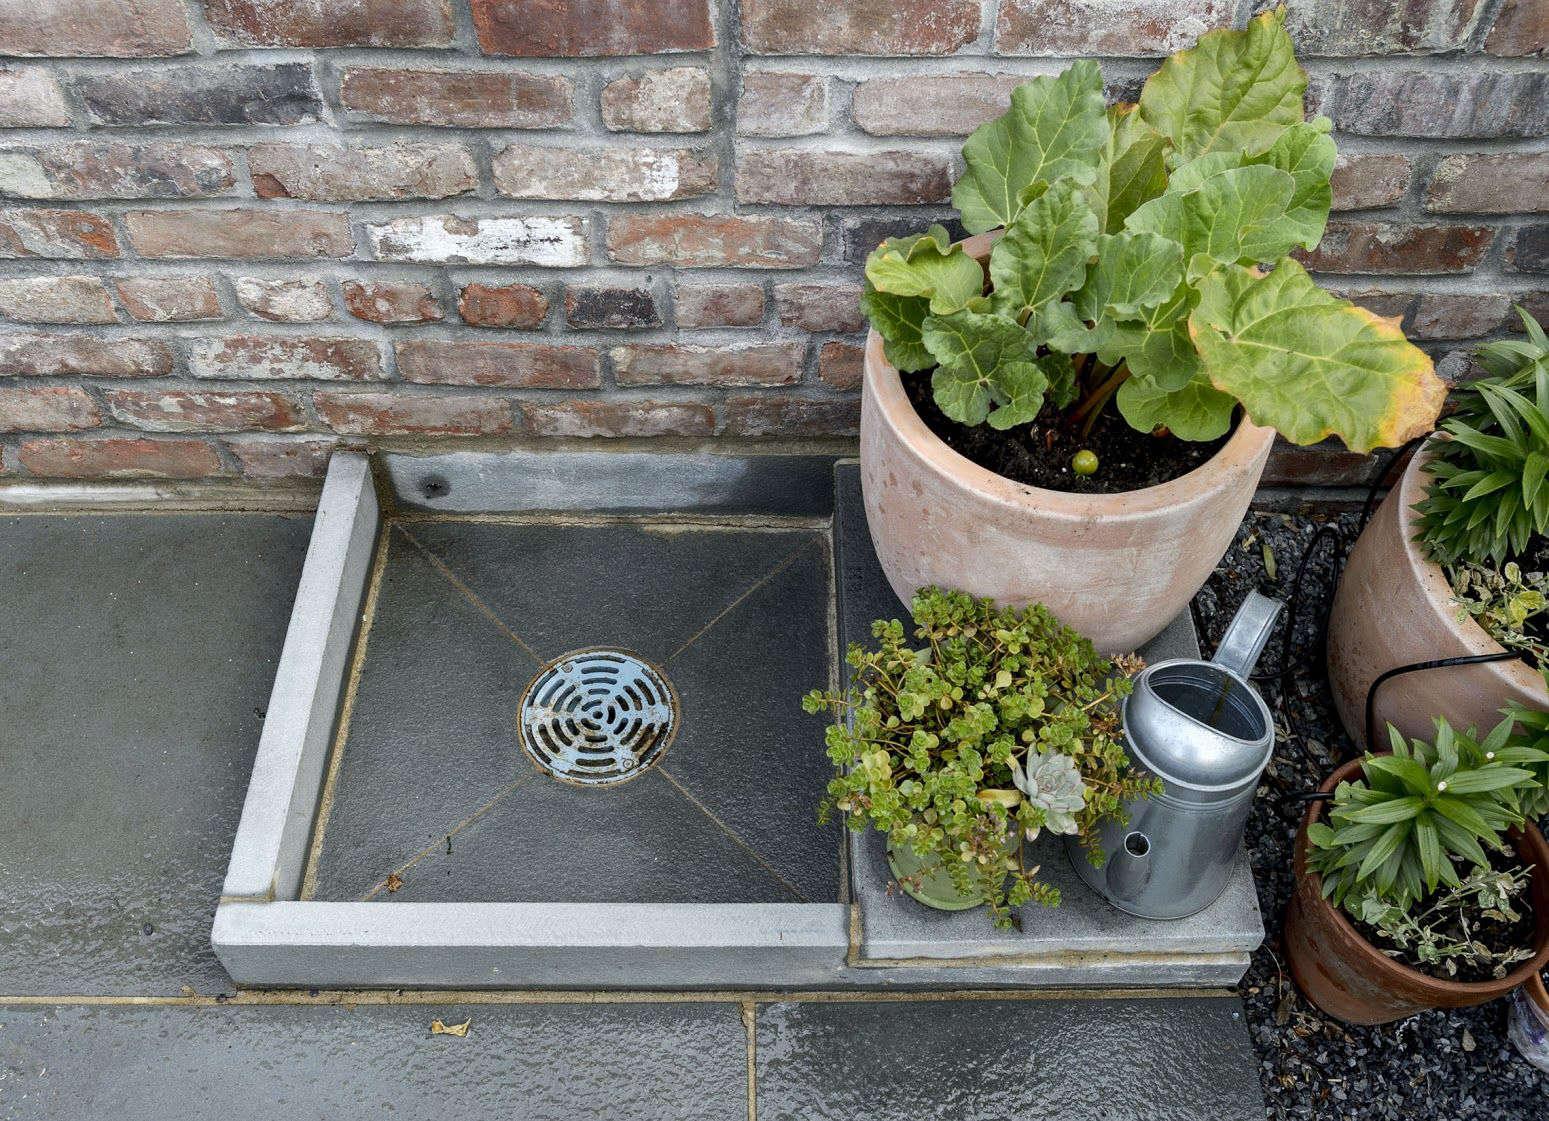 Carroll Gardens Brooklyn Lettuces in Pot Matthew Williams Gardenista-book 2